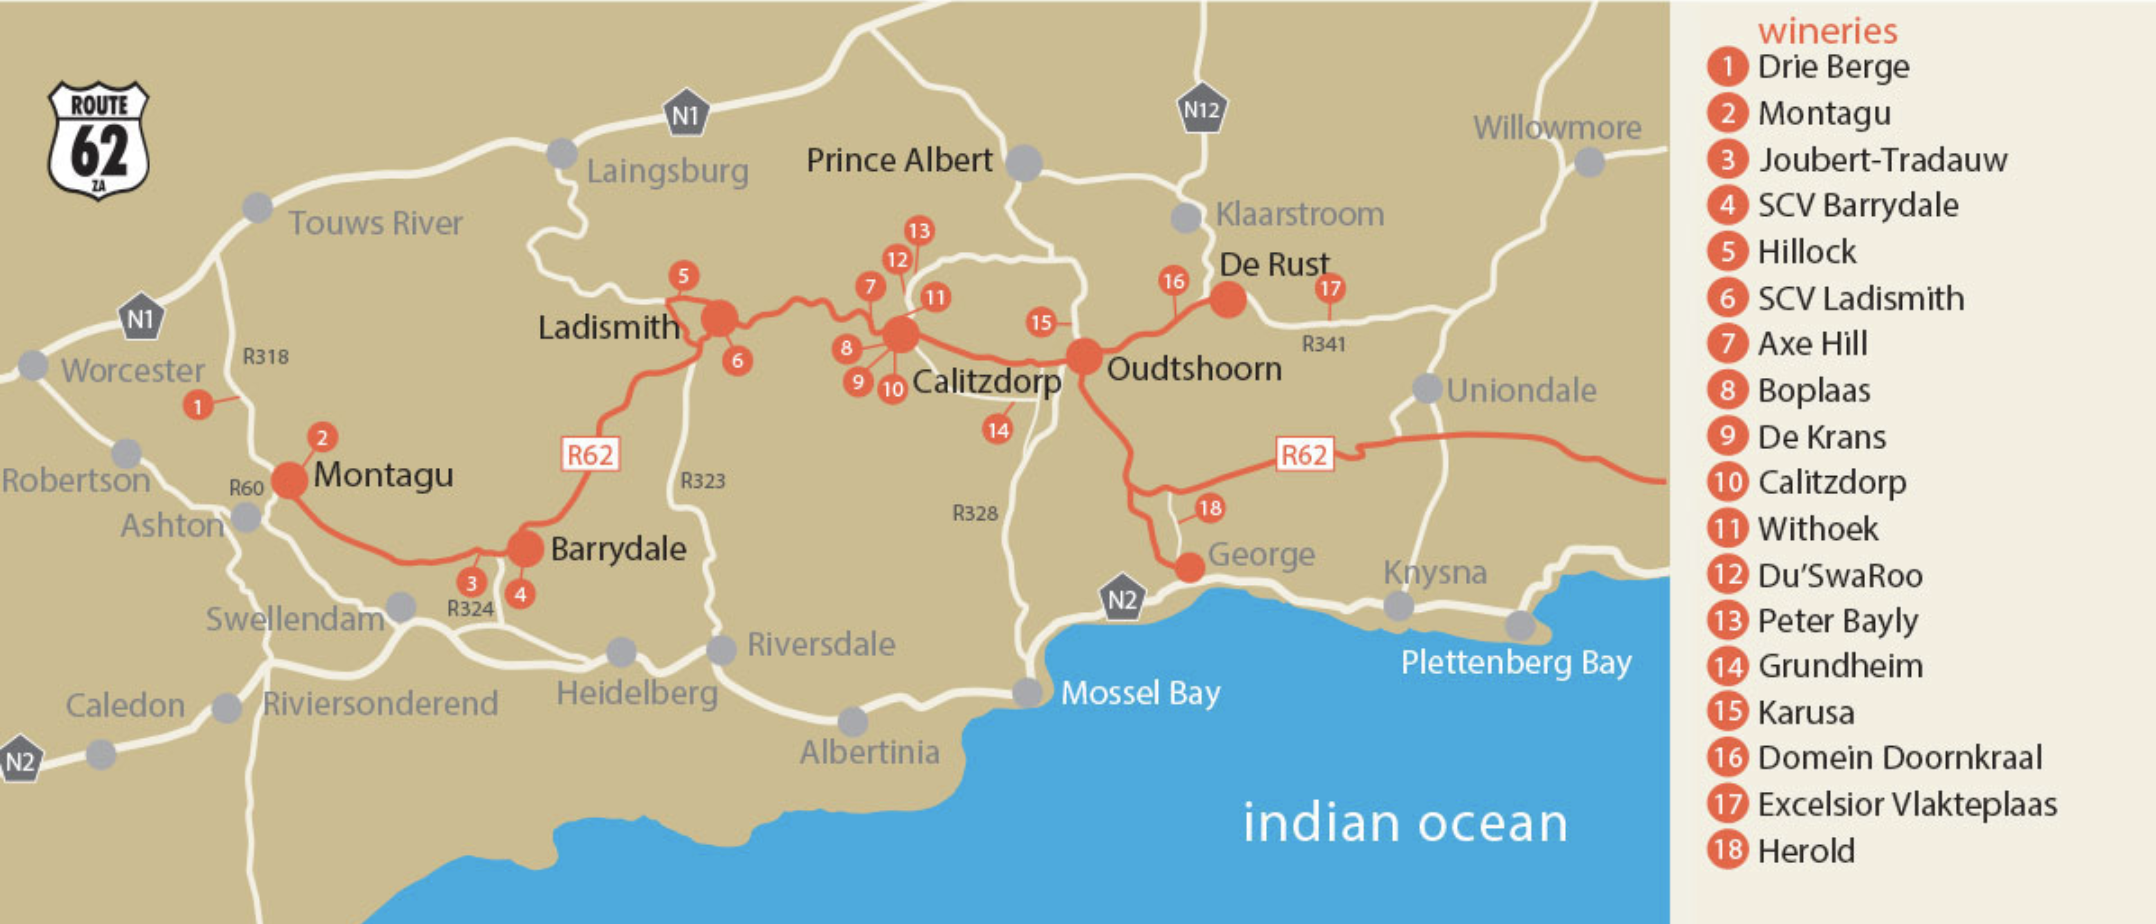 Map of The Klein Karoo Wine Route